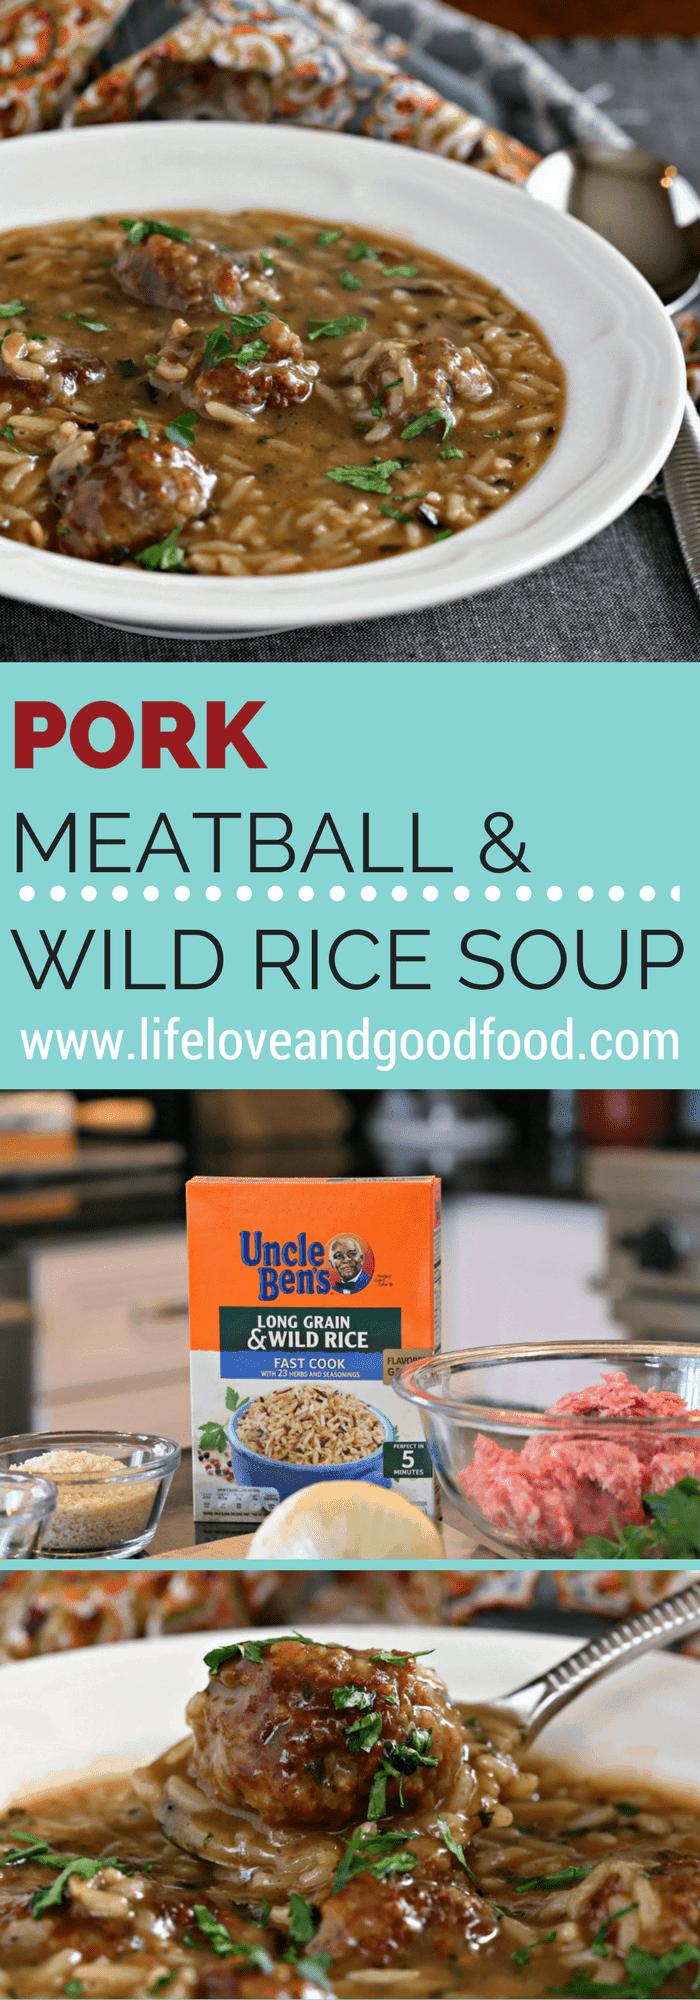 PORK MEATBALL & WILD RICE SOUP | Life, Love, and good food